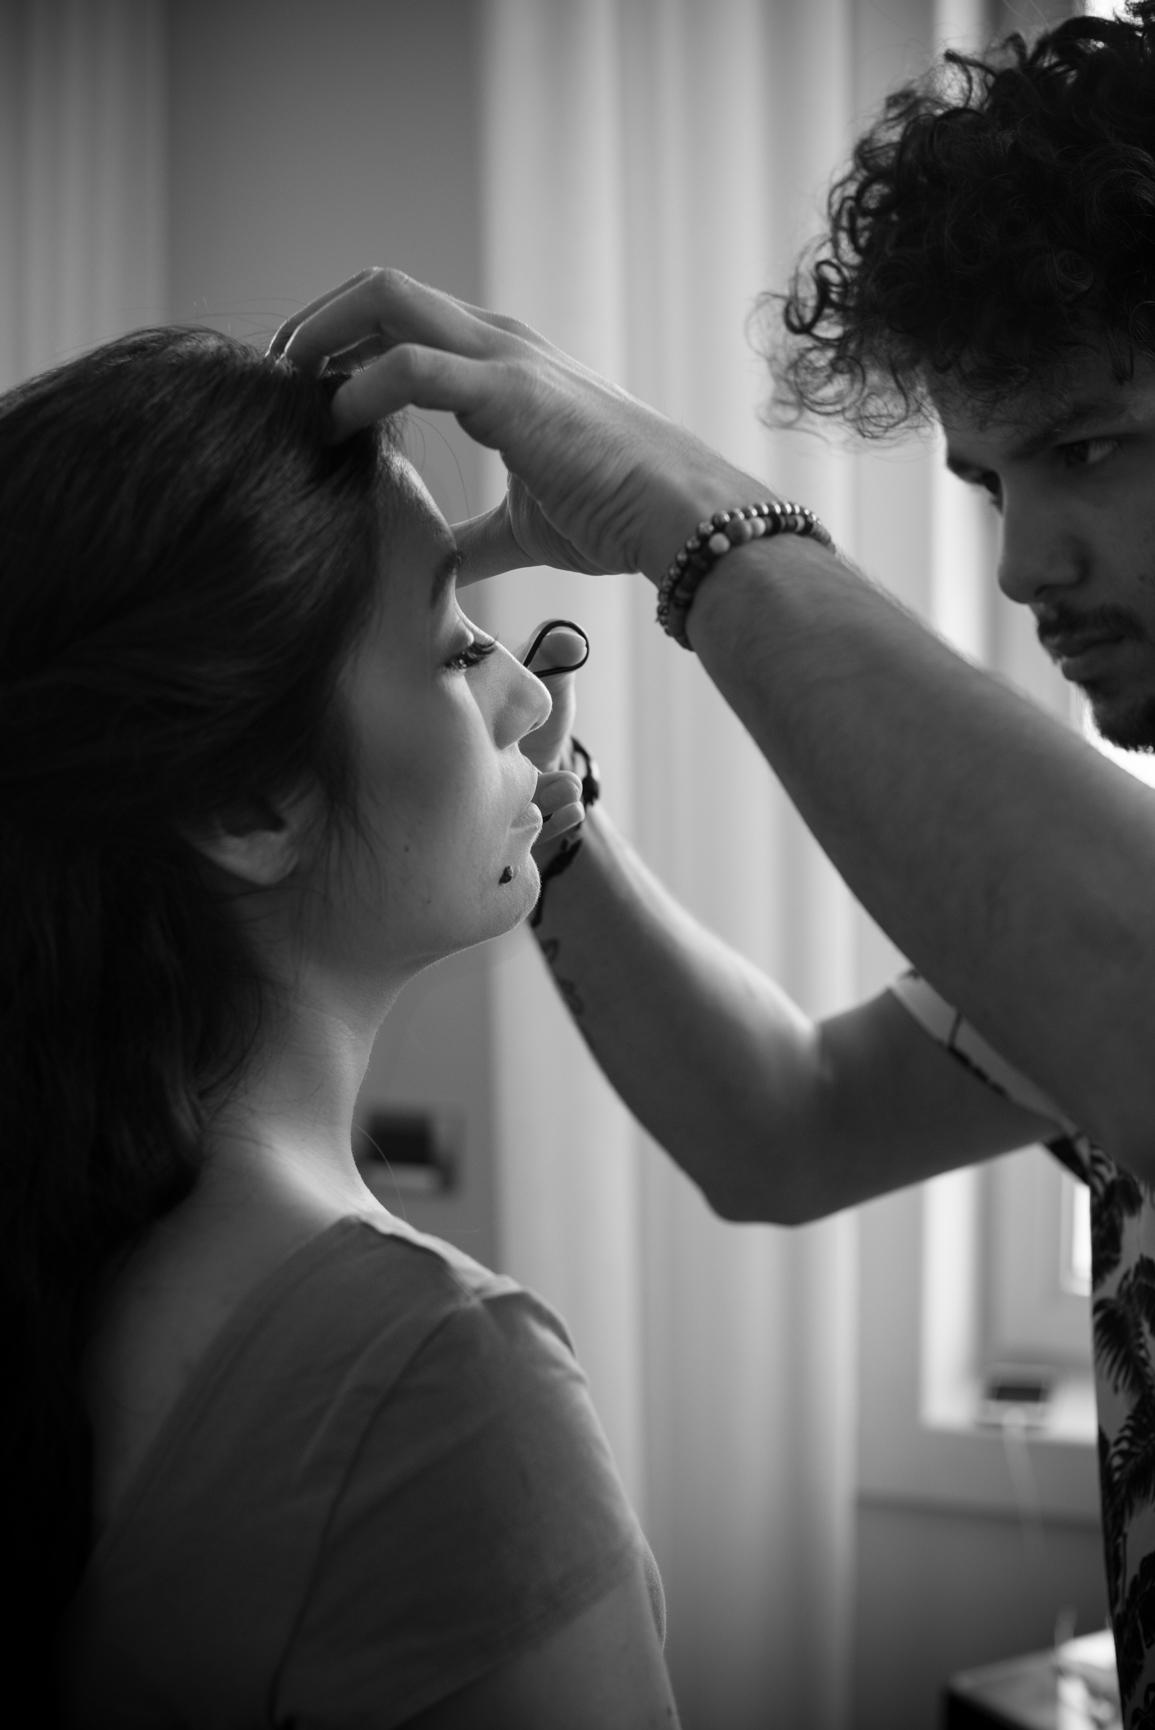 Bridal preparation photo session